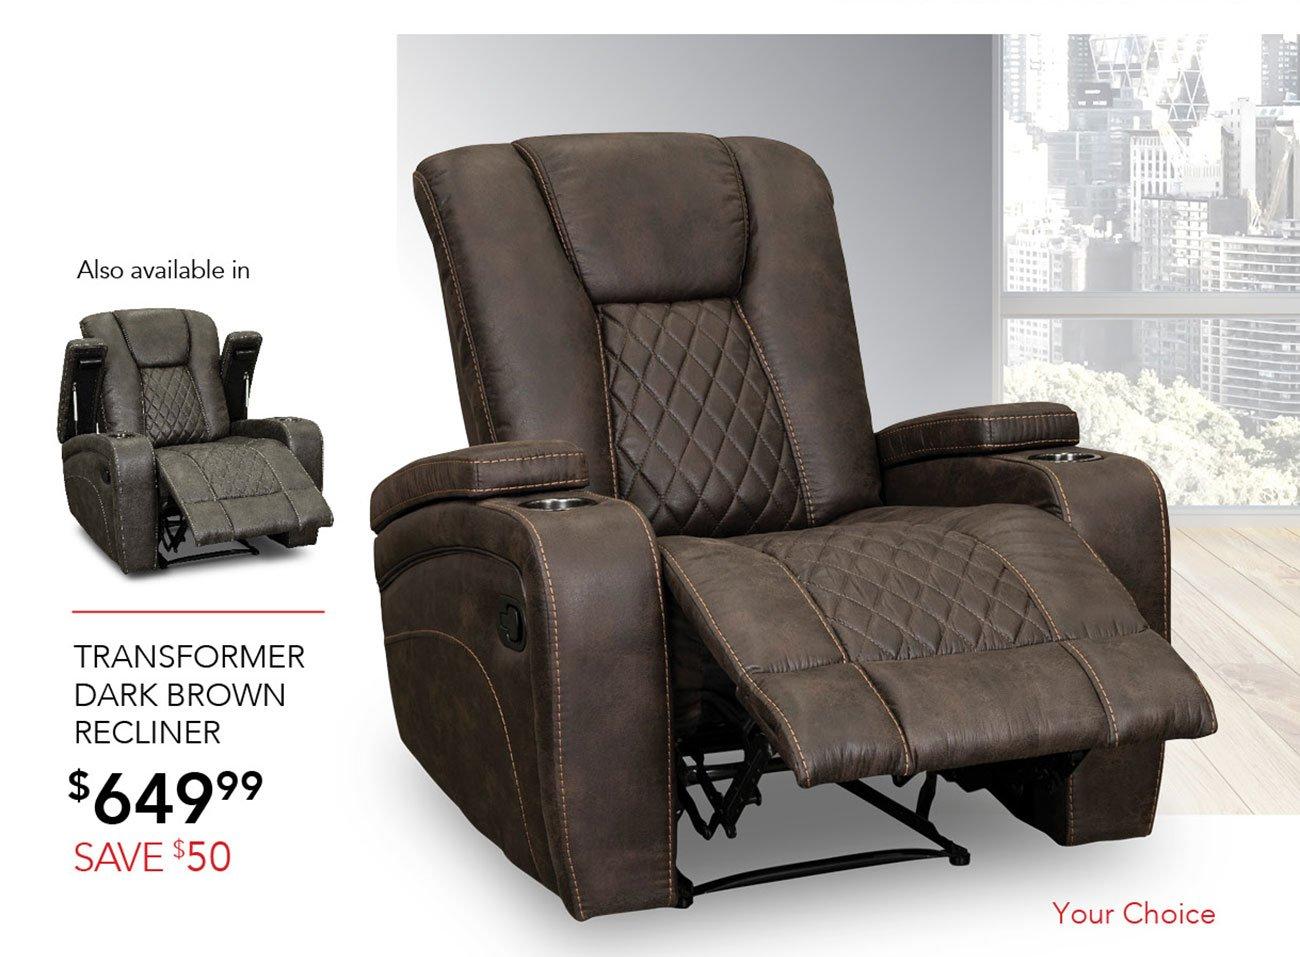 Transformer-dark-brown-recliner